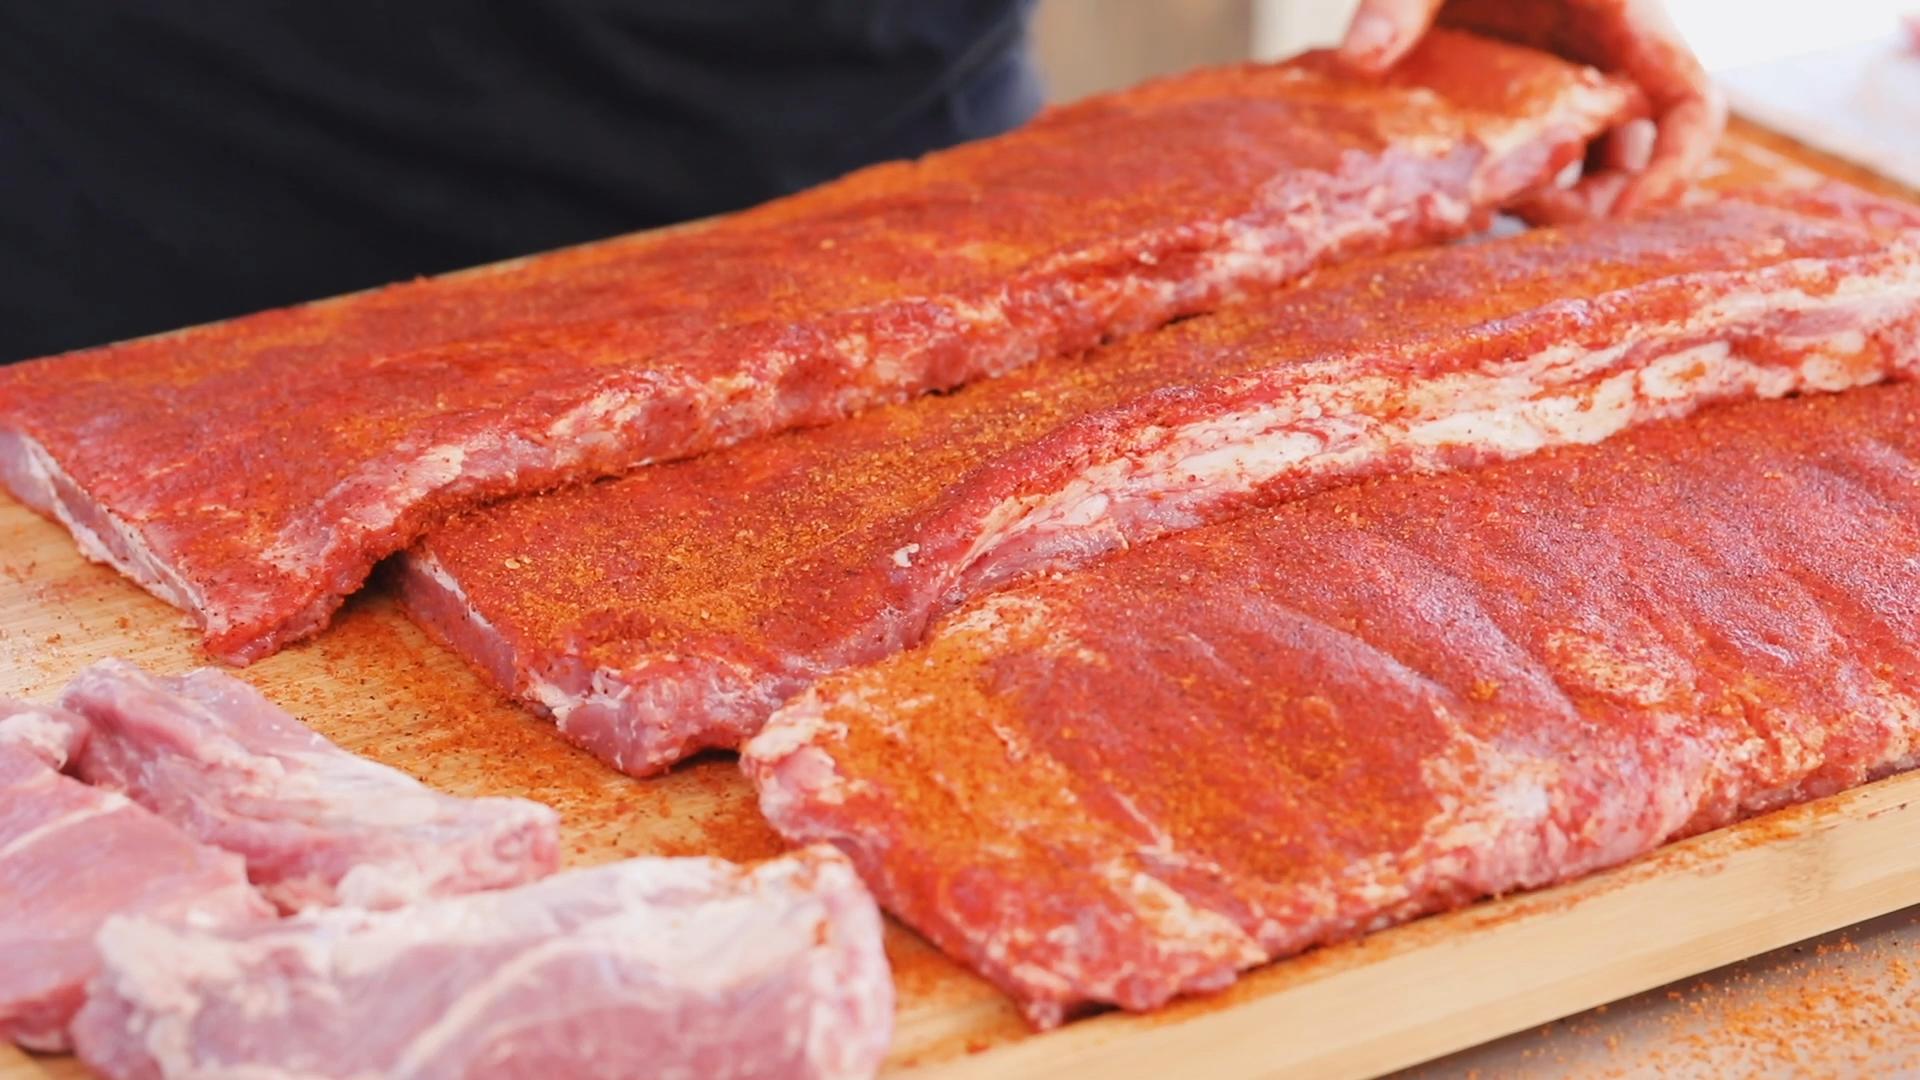 Three racks of seasoned ribs on a wooden cutting board.